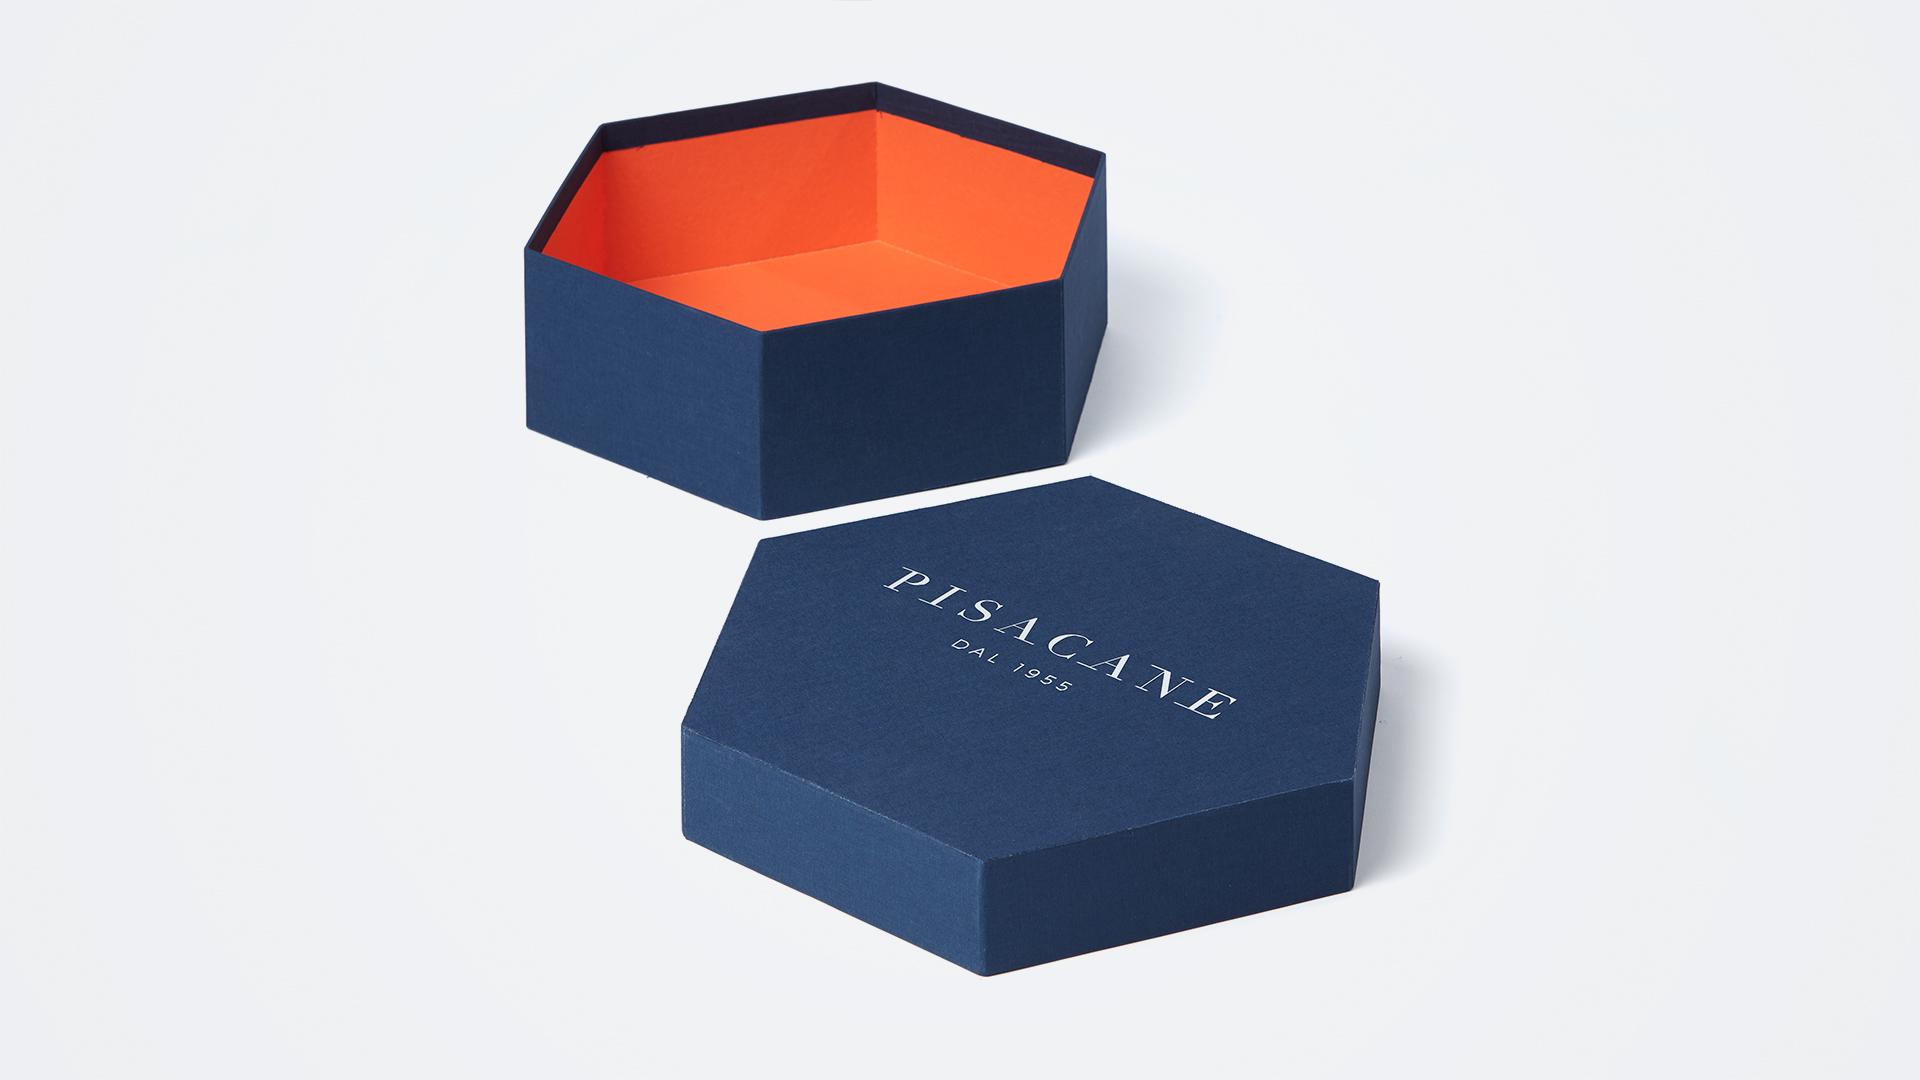 scatola esagonale in tela e logo mettallico